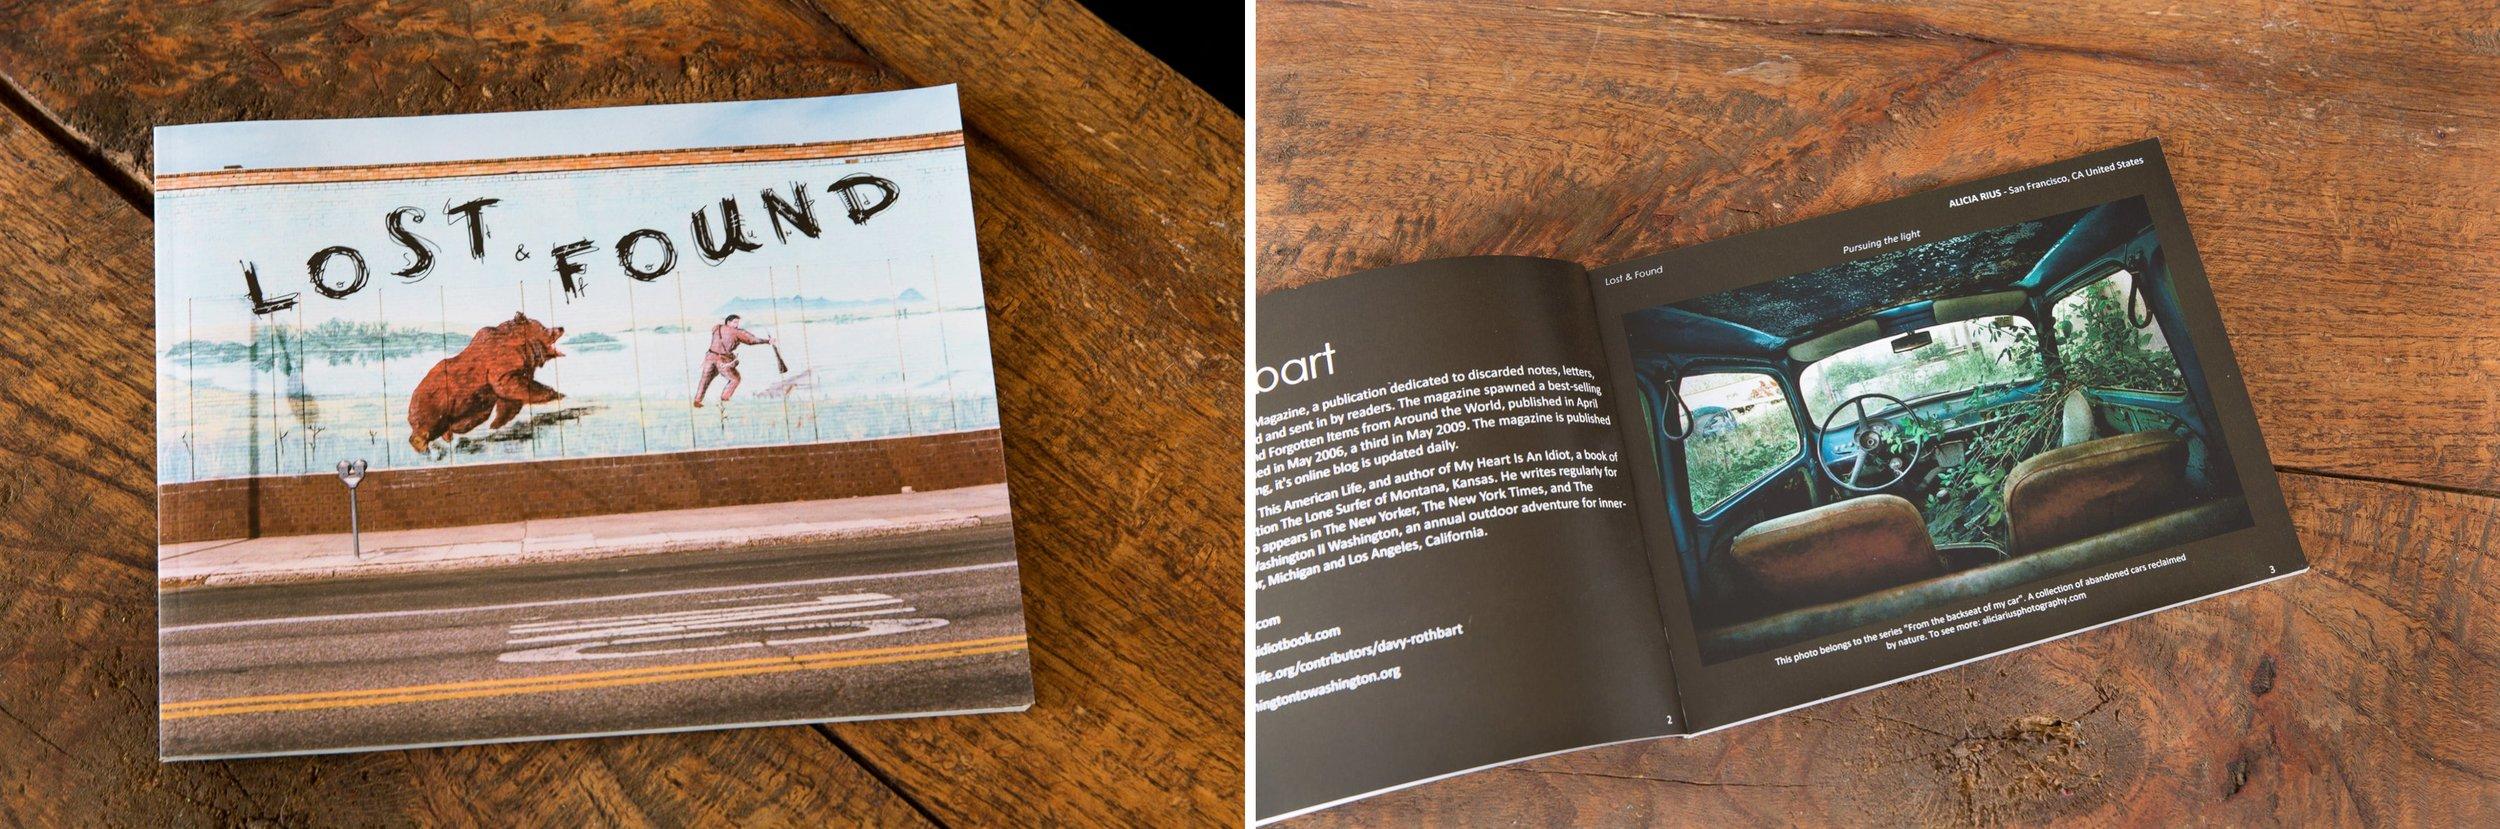 "Darkroom gallery ""Lost & Found"" photography Awards book (Vermont, United States)."